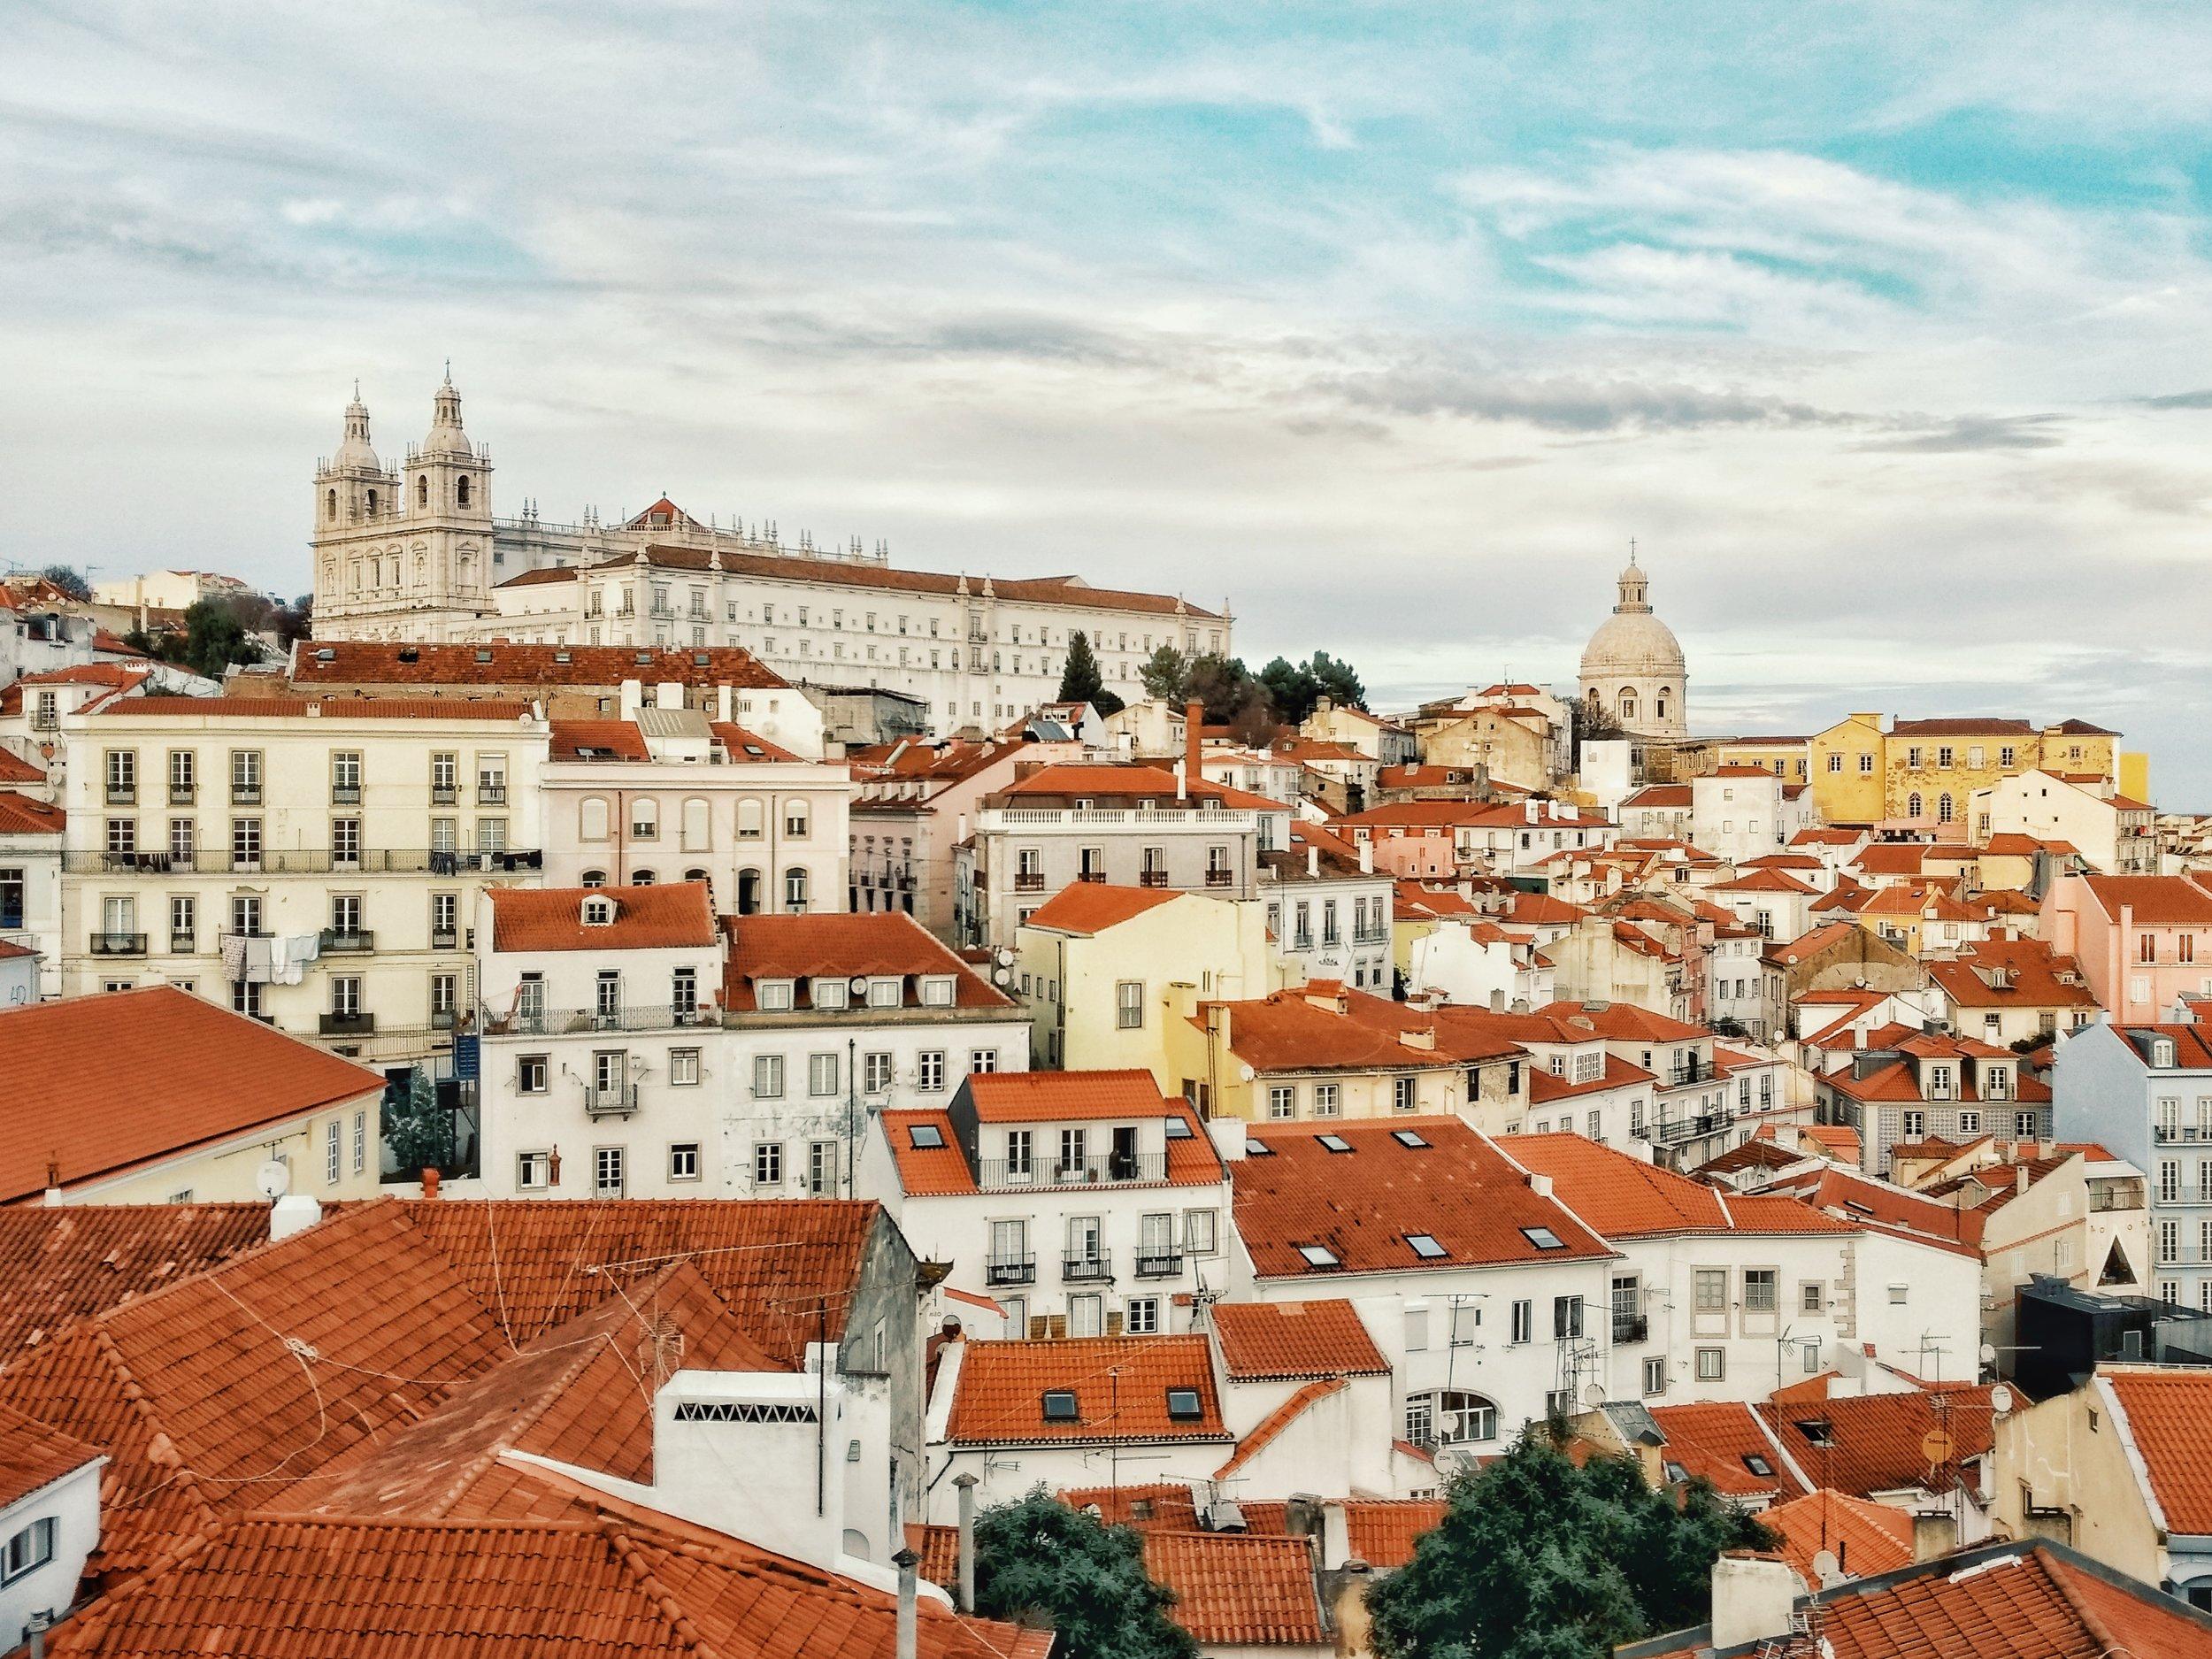 SEPTEMBER 5 - 16, 2019 - A pilgrimage to France, Spain, and Portugal. Highlights include Lourdes, Santiago De Compostela, and Fatima.